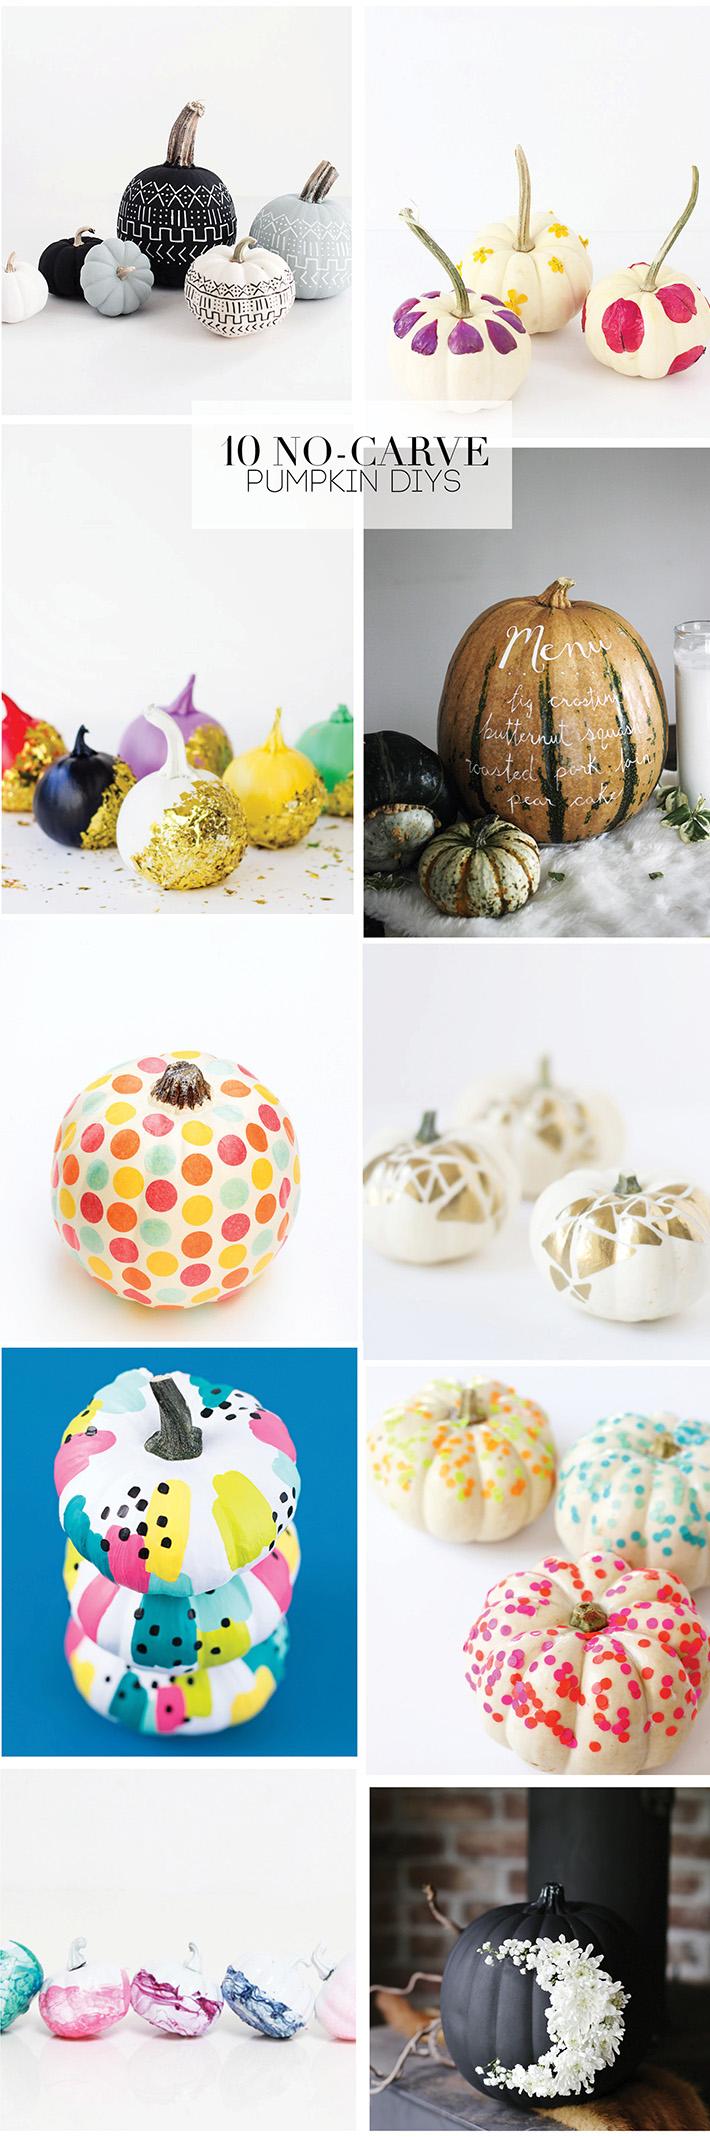 Favorite No Carve Pumpkin DIY ideas for Halloween